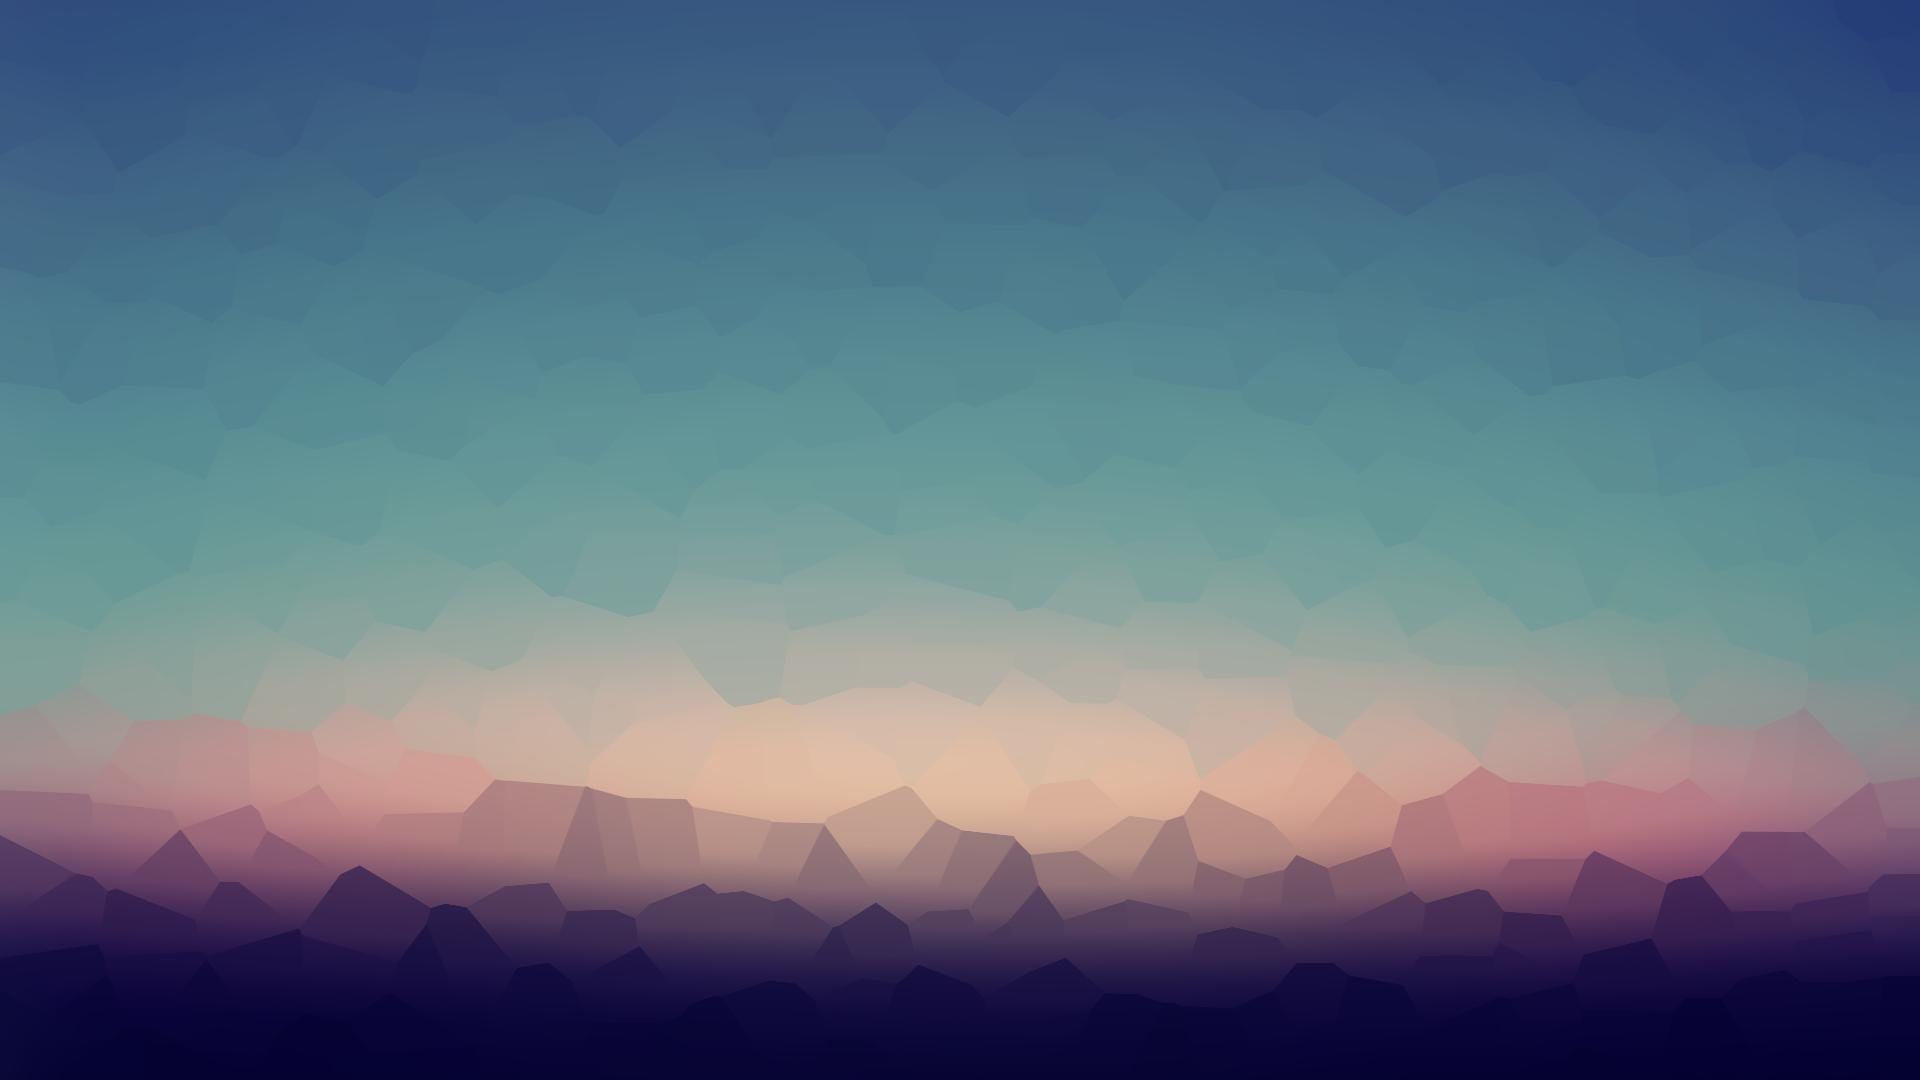 Amazing Wallpaper Mountain Polygon - 3ed22d3b73876672ffc037e6a99562eb  Image_416452.png